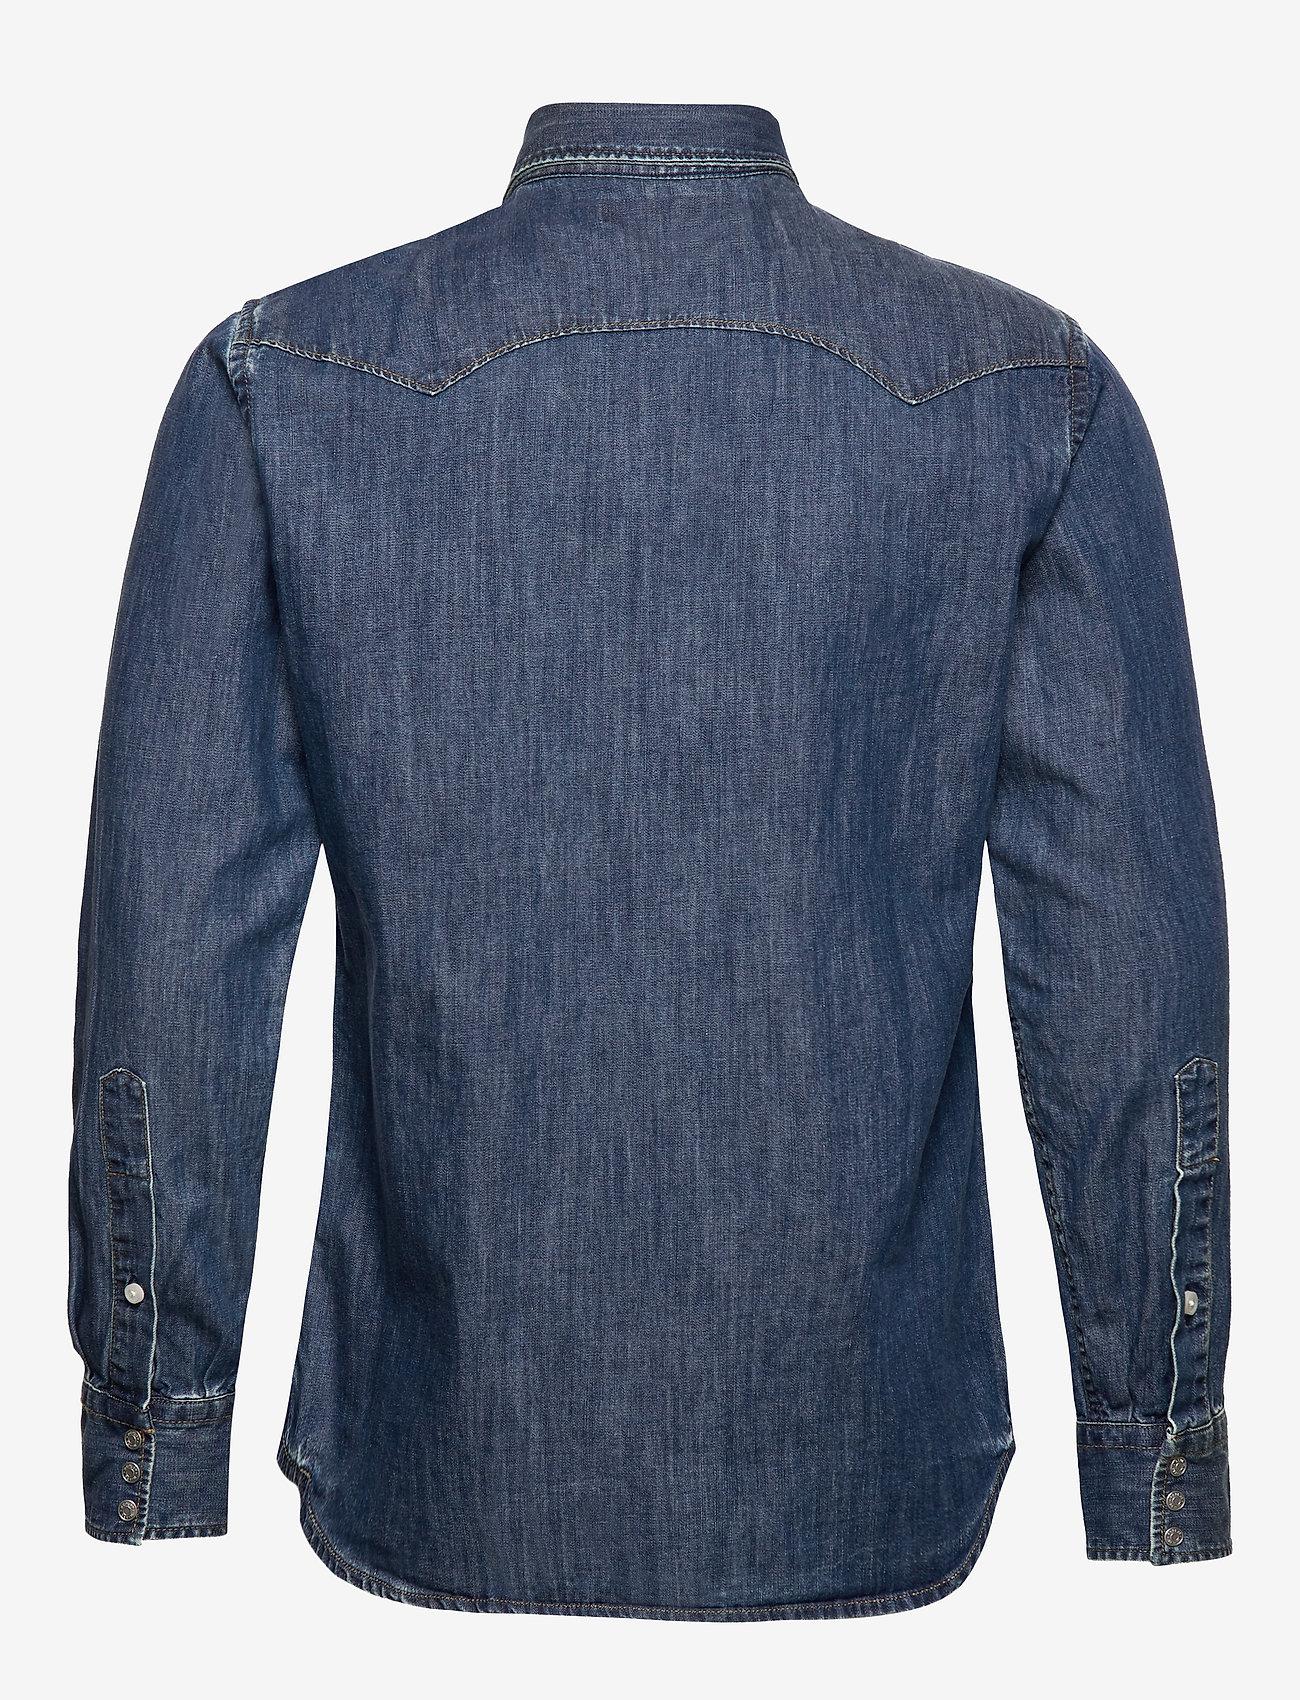 Replay - Shirt - podstawowe koszulki - medium blue - 1